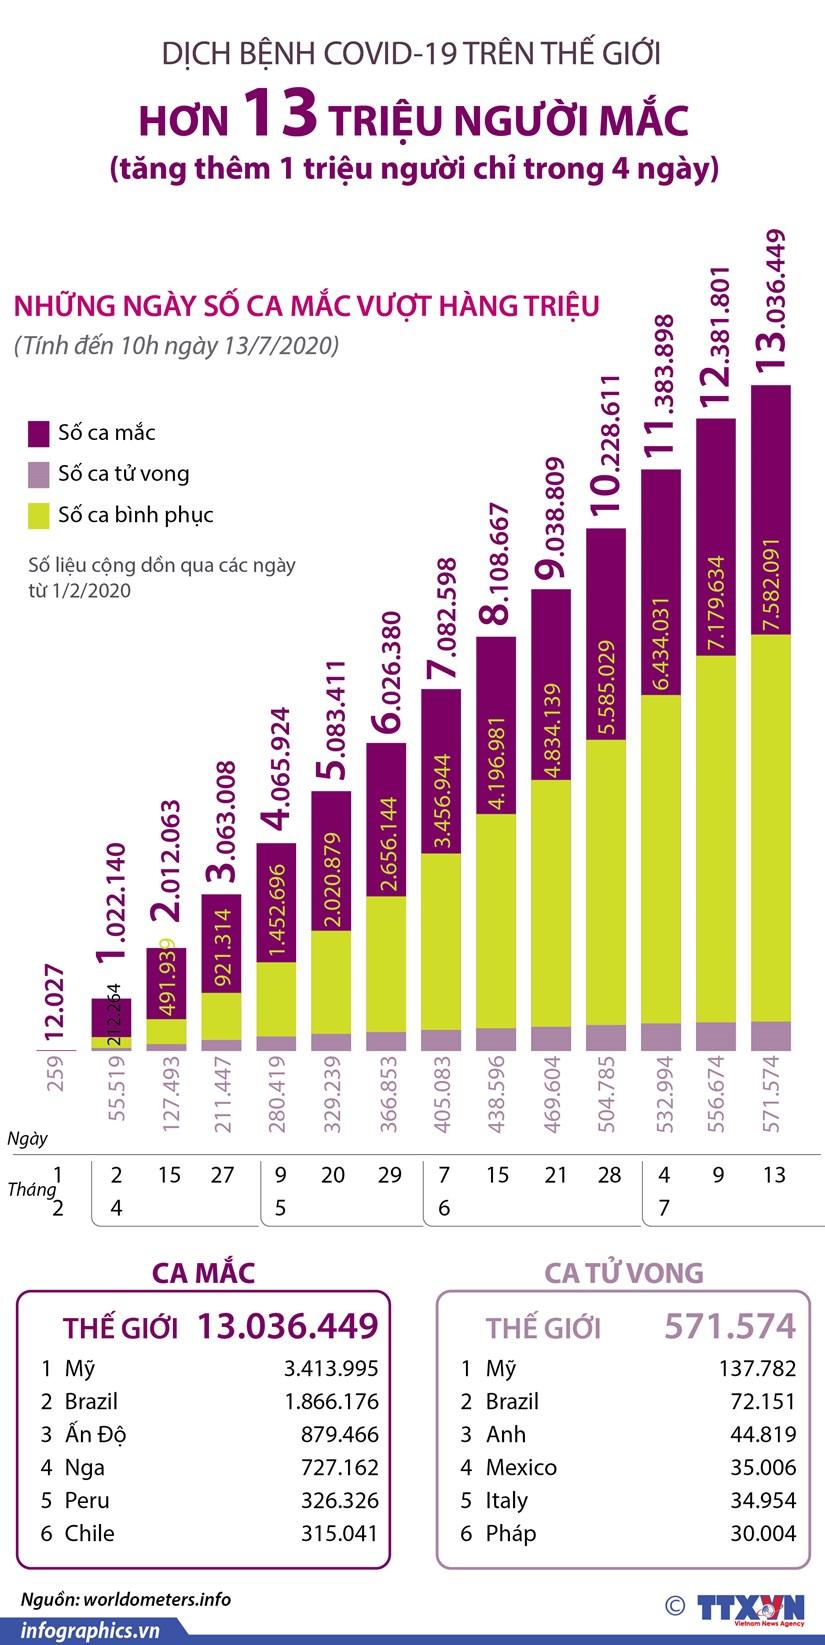 [Infographics] So ca mac COVID-19 toan cau vuot moc 13 trieu nguoi hinh anh 1